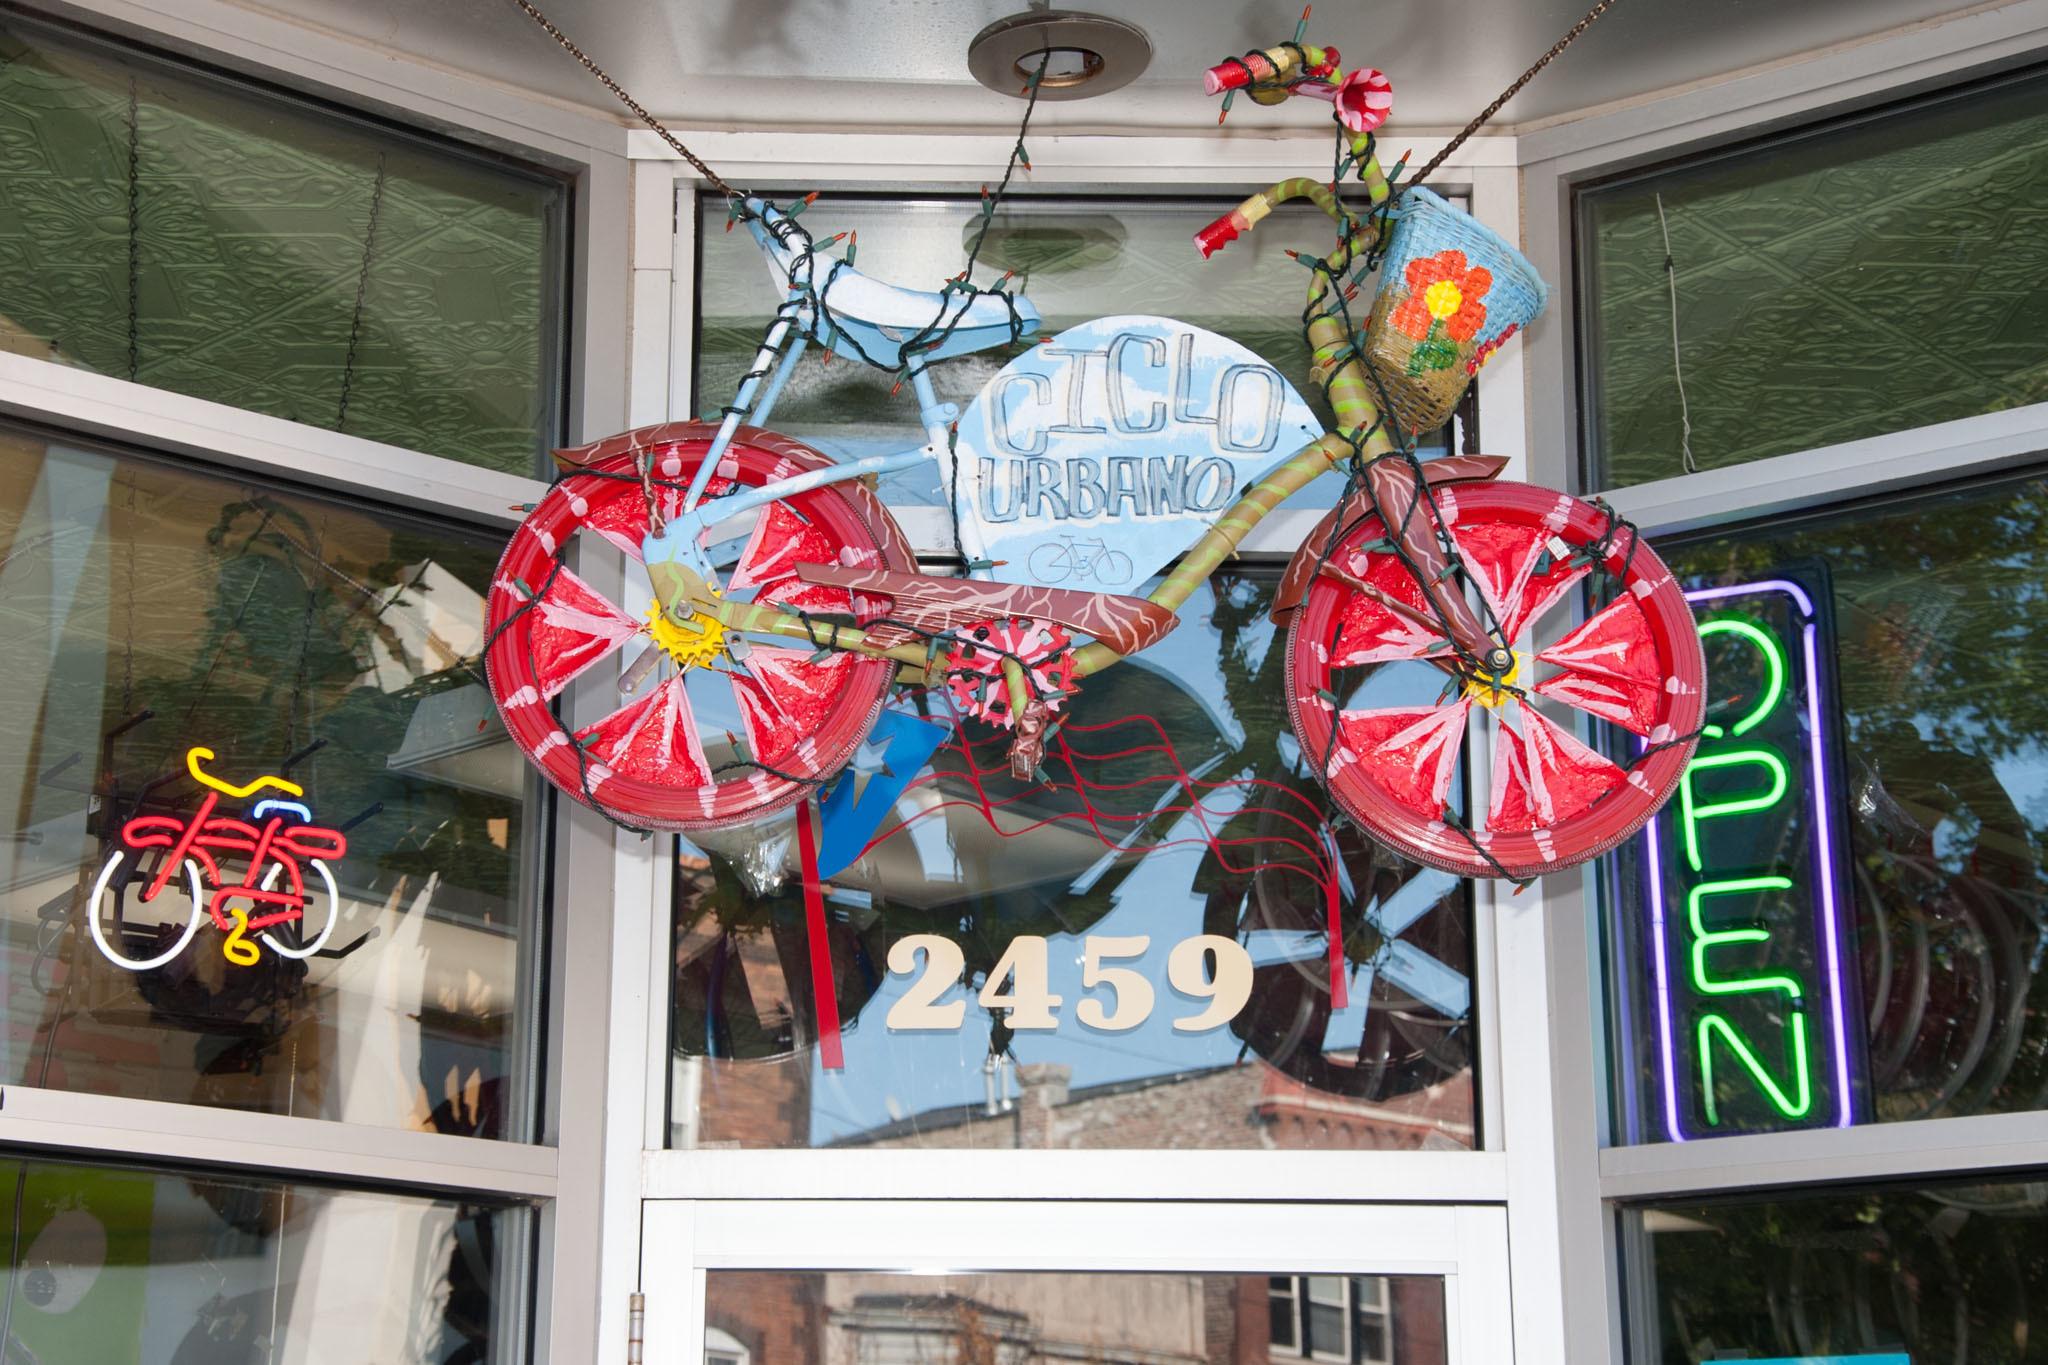 Ciclo Urbano/West Town Bikes